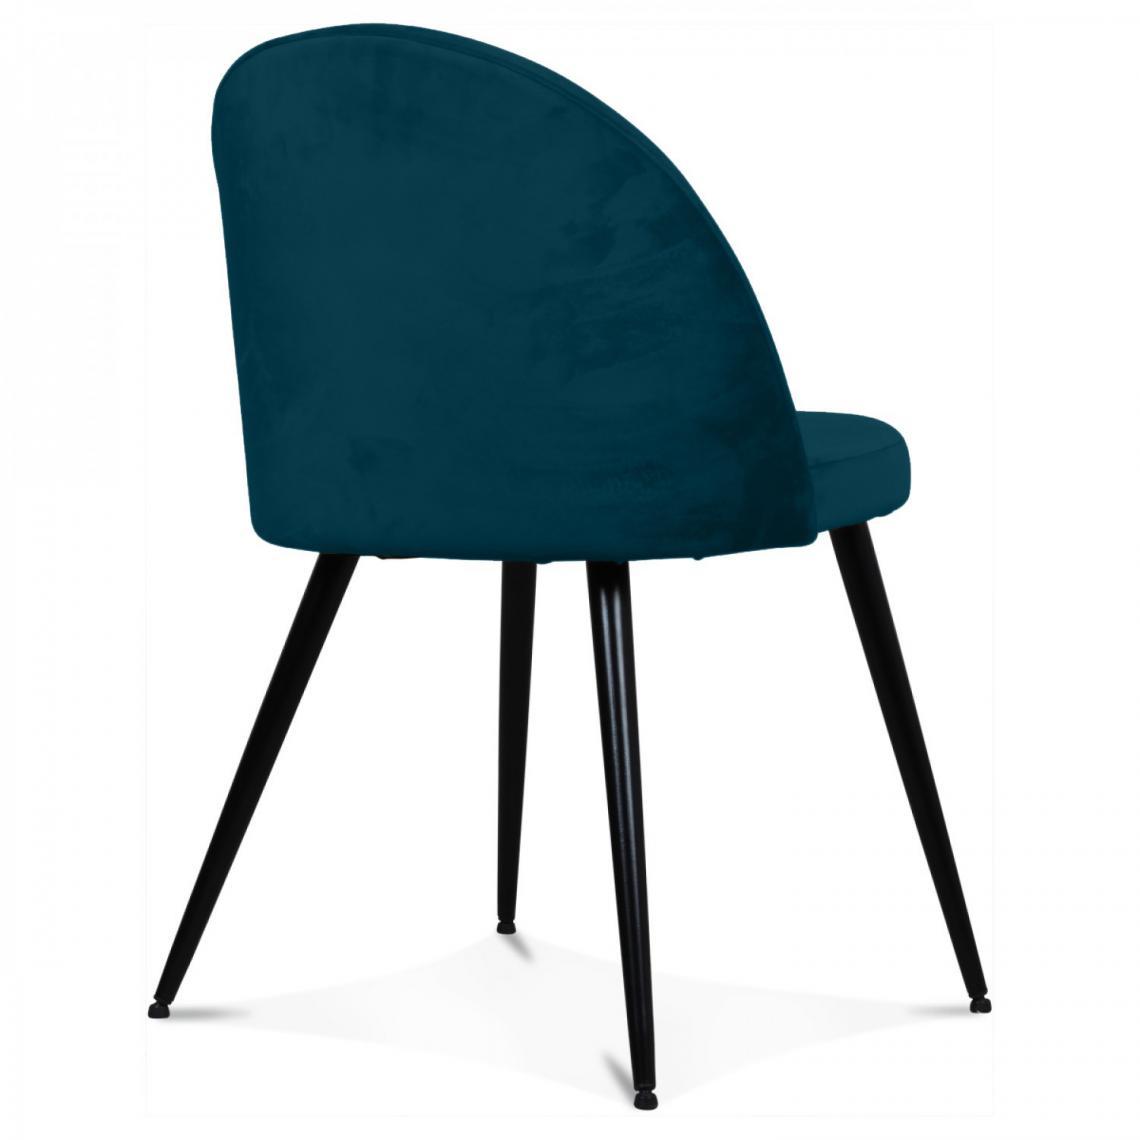 chaise tissu bleu canard bradley 3